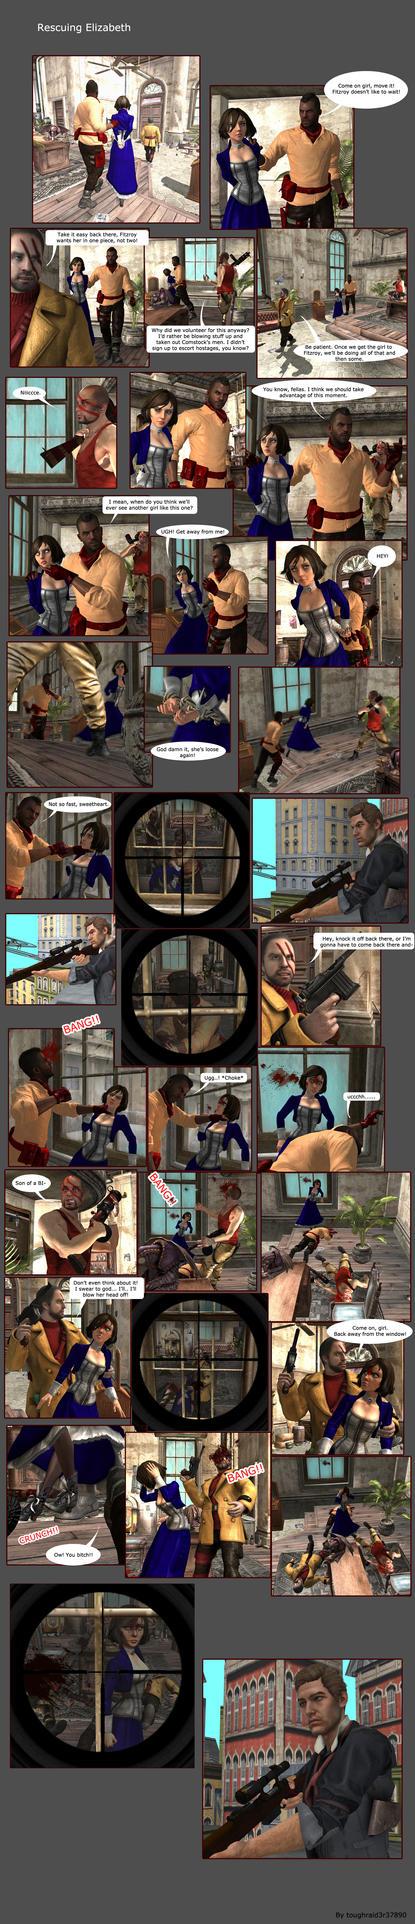 Rescuing Elizabeth Comic by toughraid3r37890